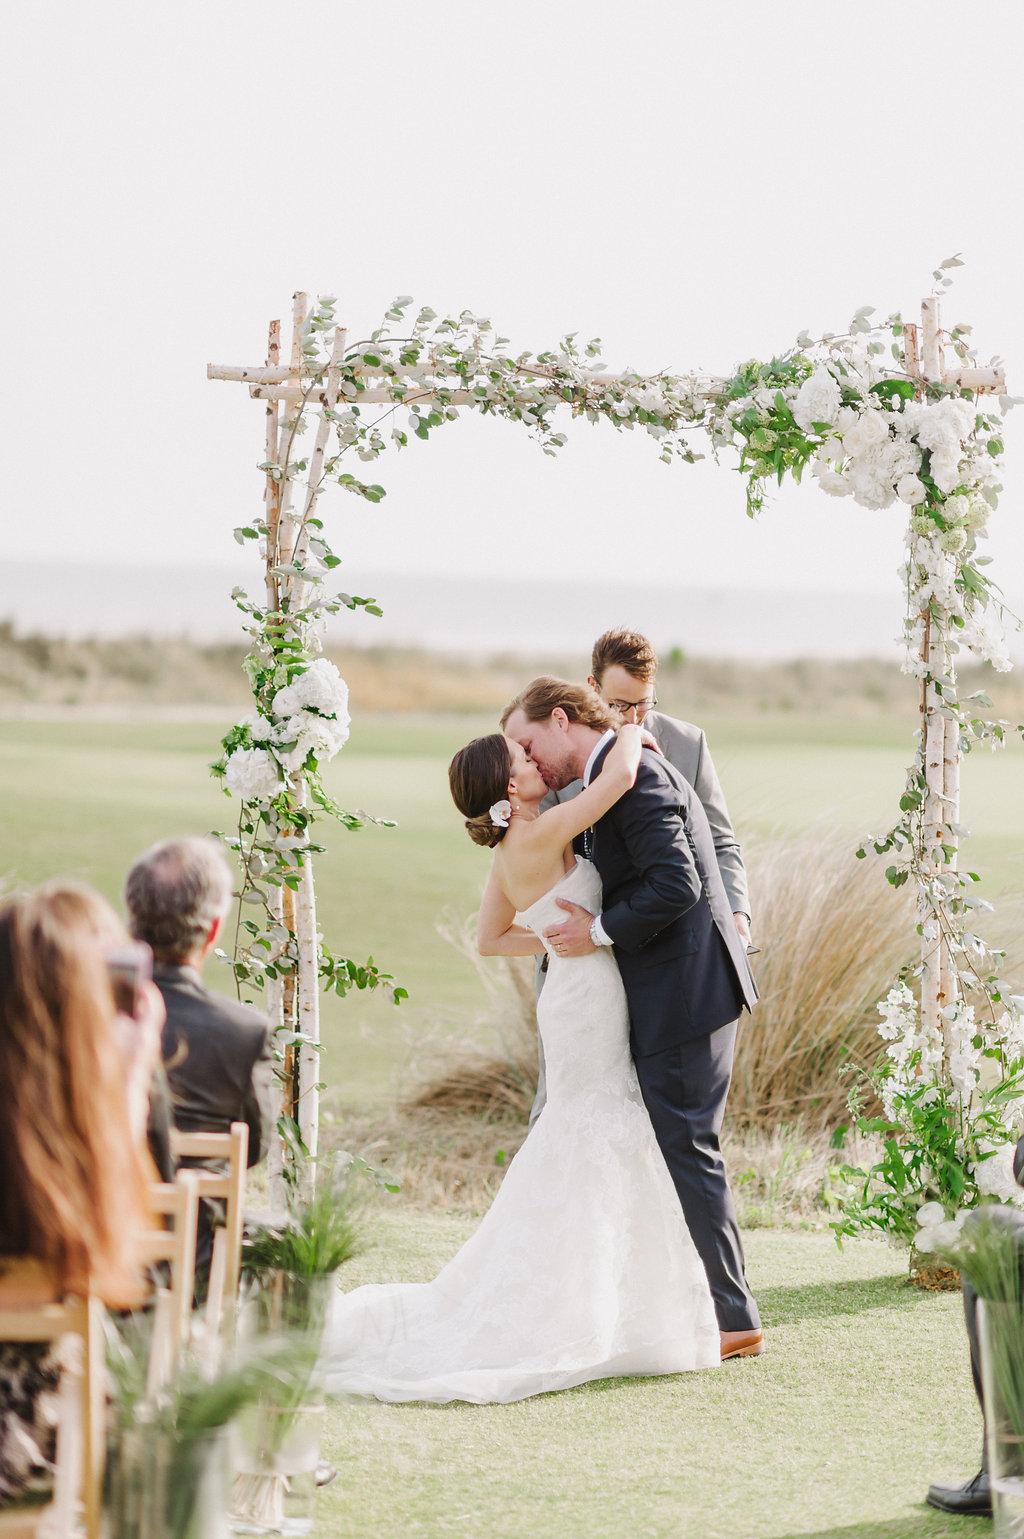 Wedding by the sea, Events by Reagan, Kiawah Wedding, Charleston Wedding Planner, Wedding Ceremony, Bride and Groom Kiss,  Flower Arch